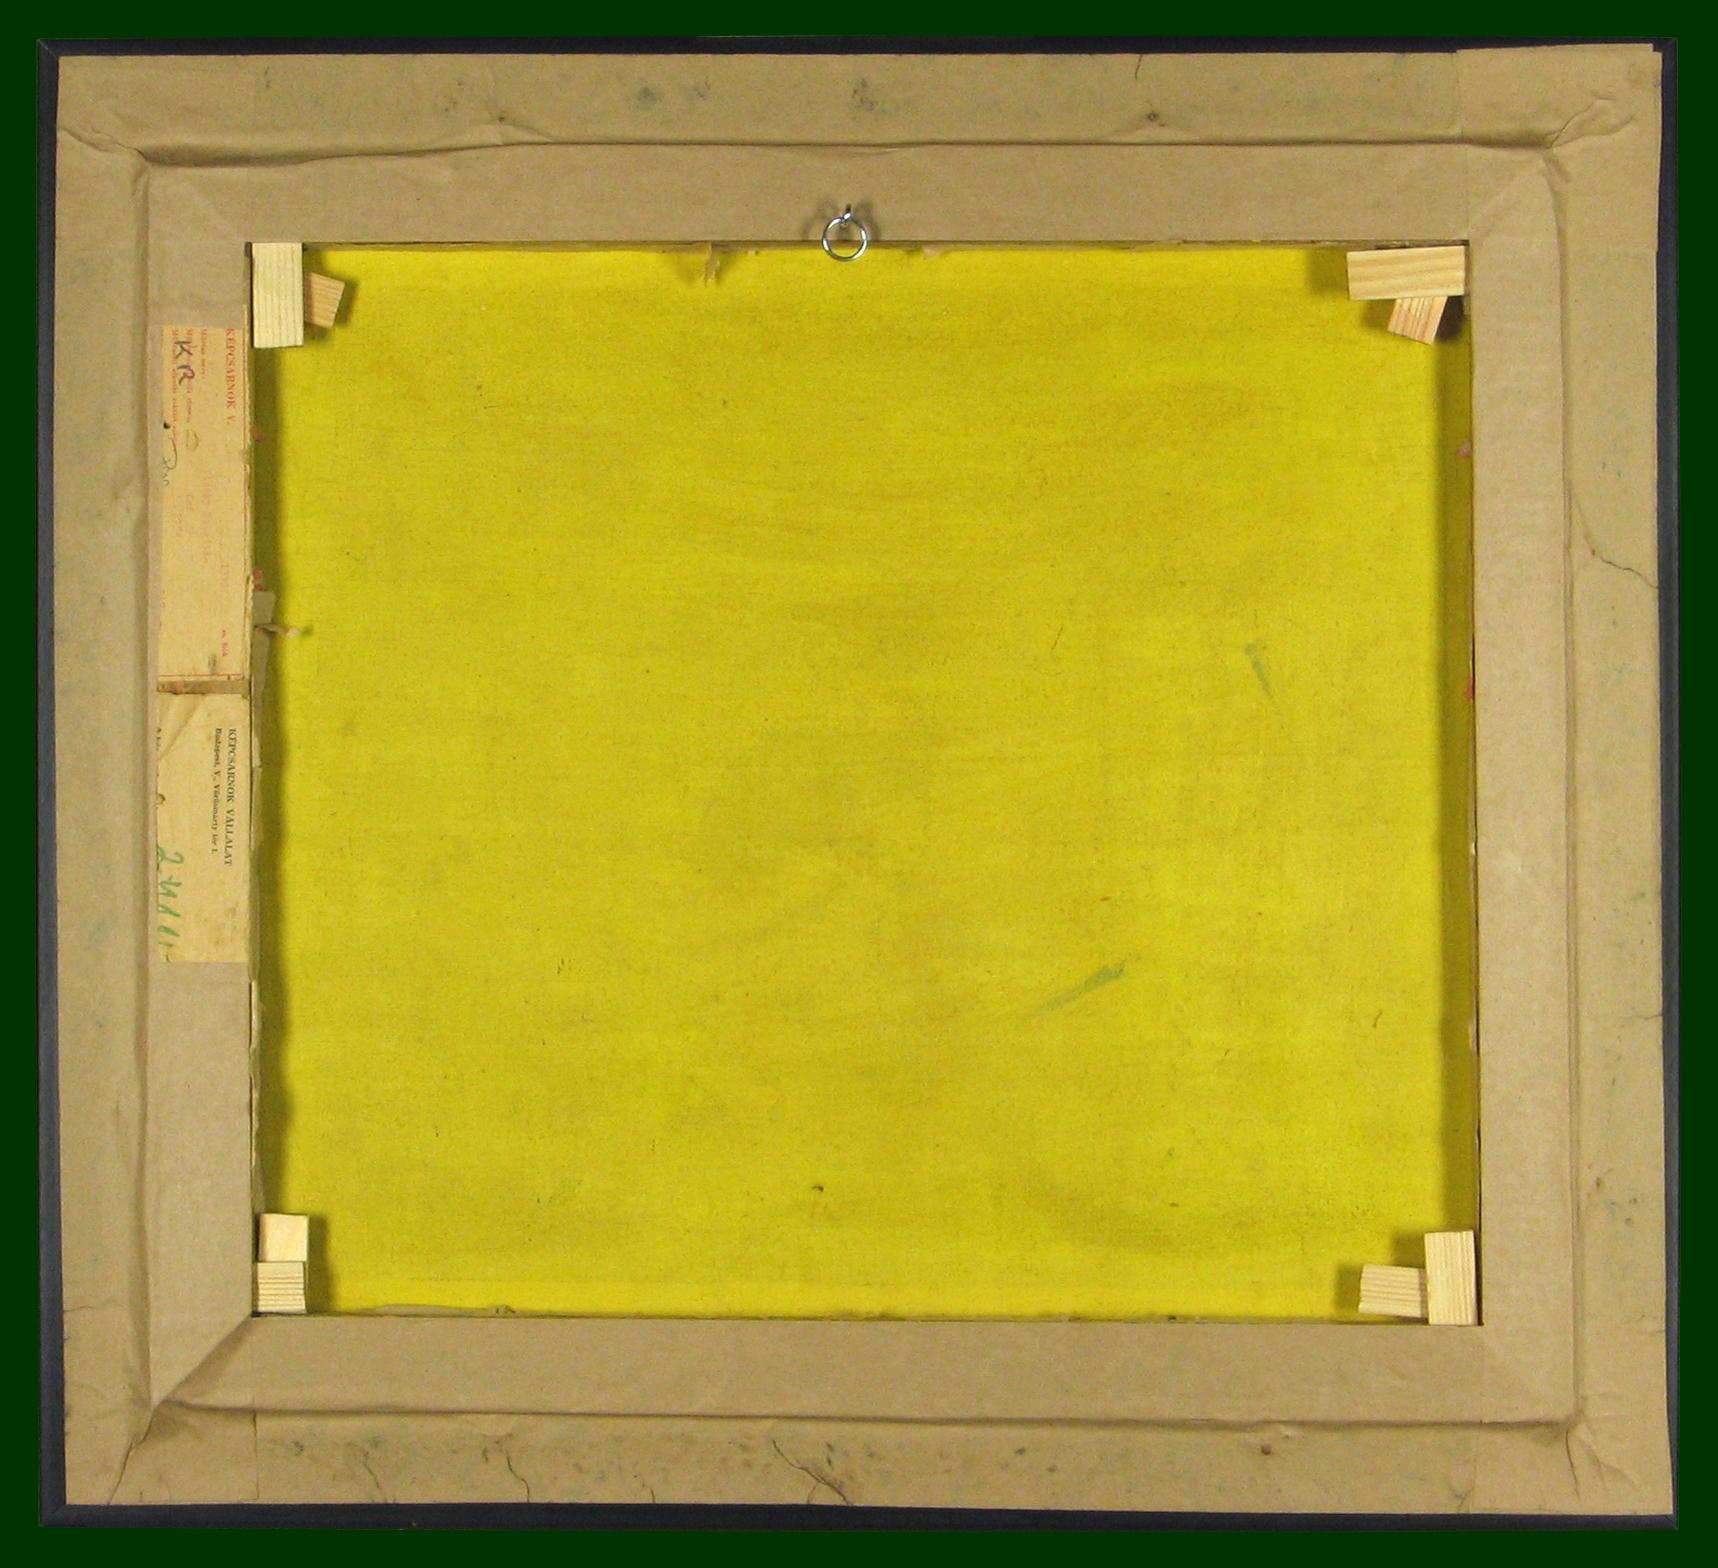 44-12h_t.jpg (1718×1568)